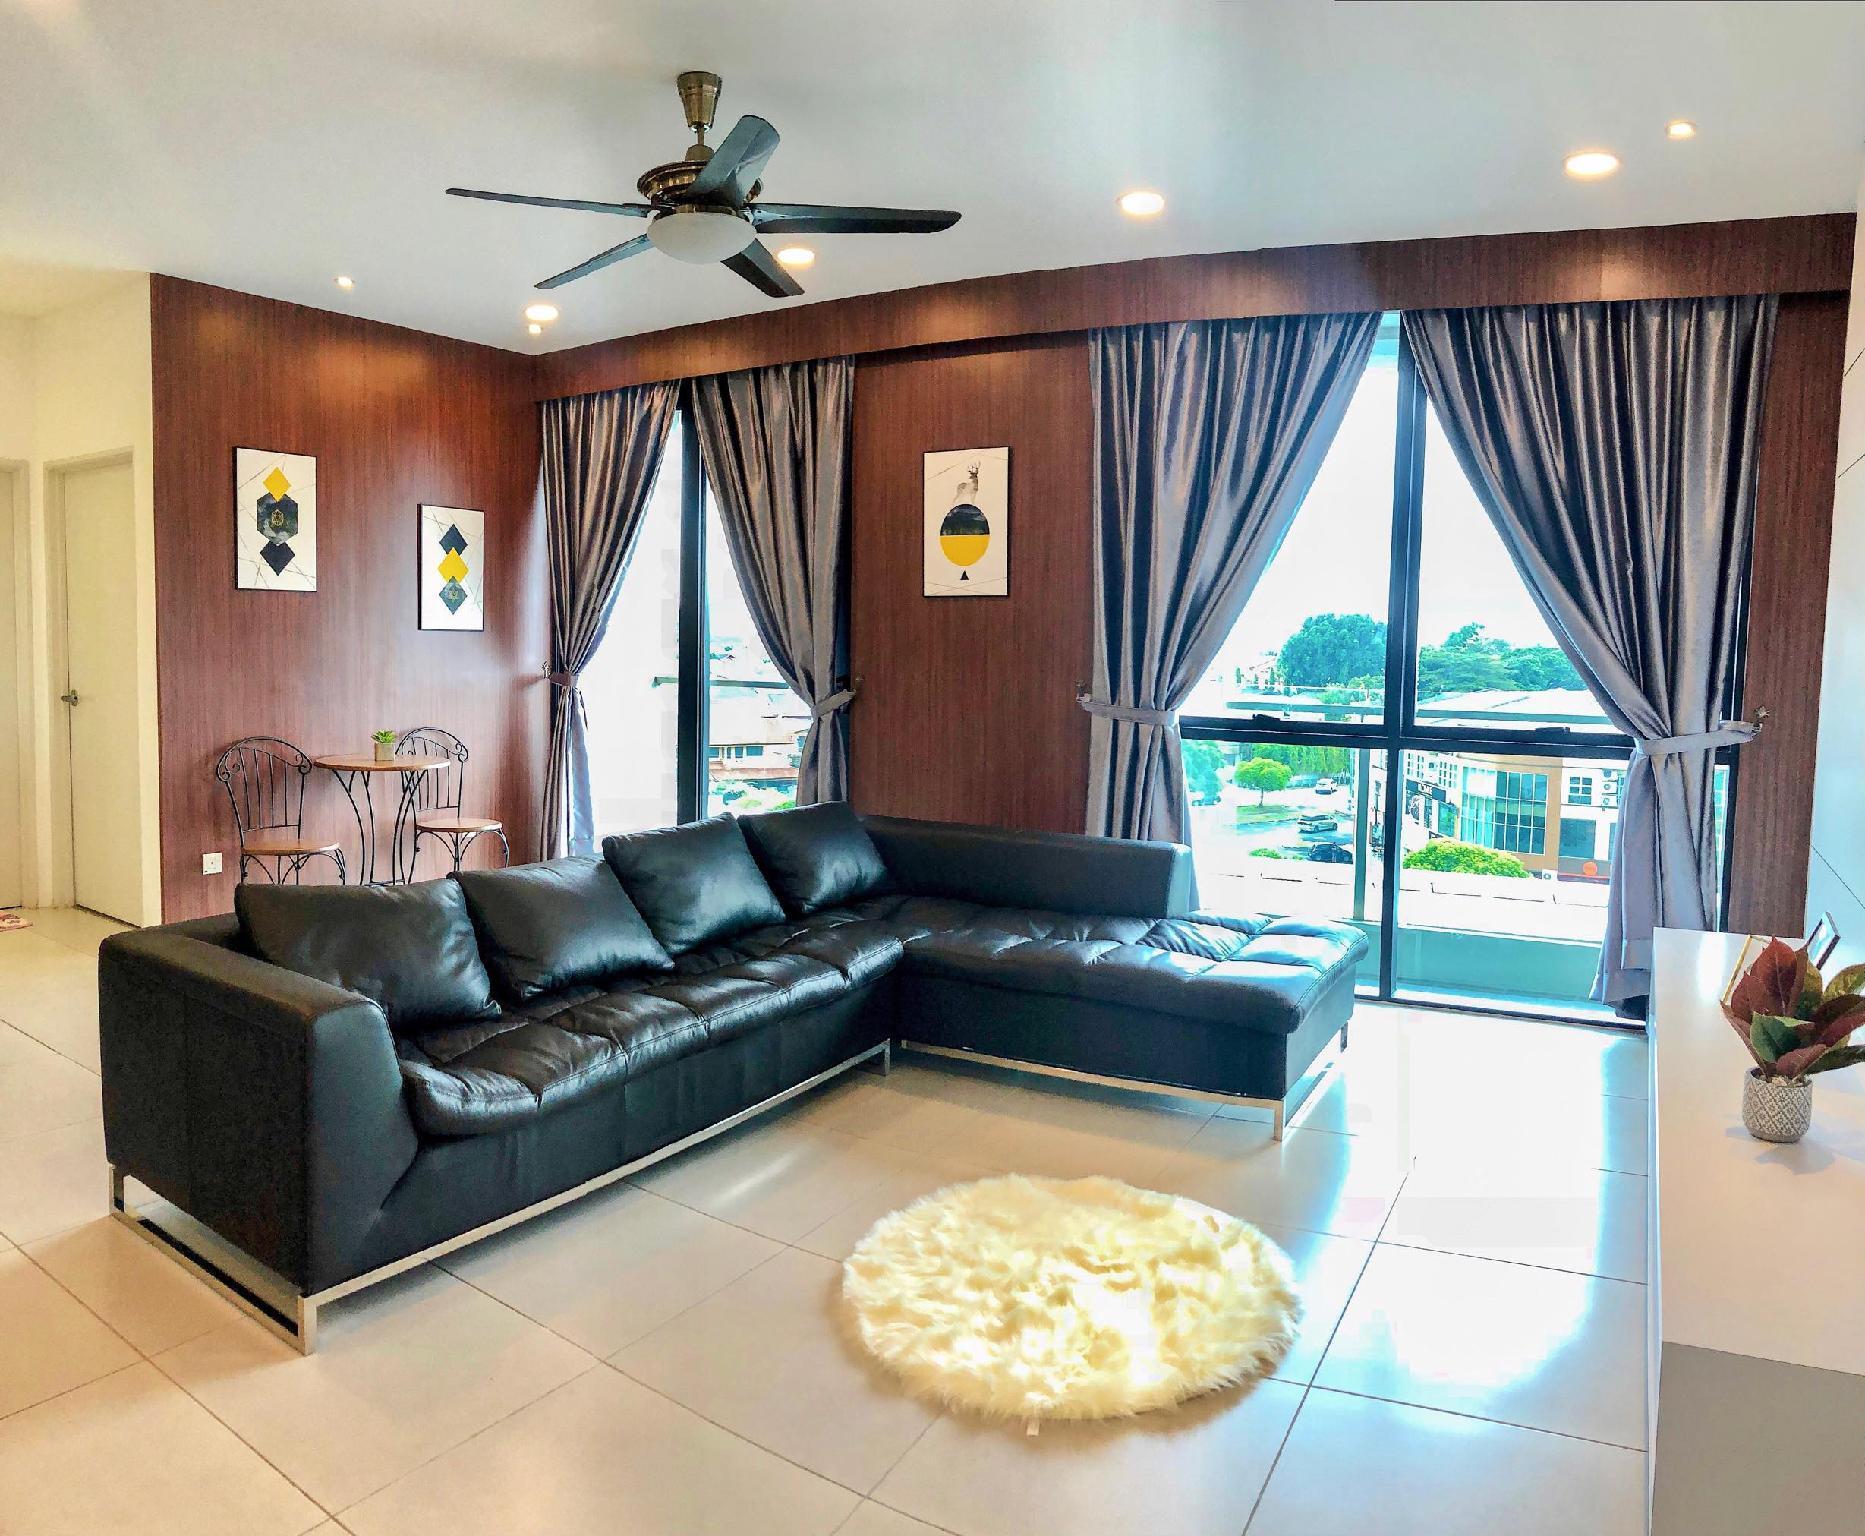 [PROMO] La familia @ deLOFTS Residences | Kuching